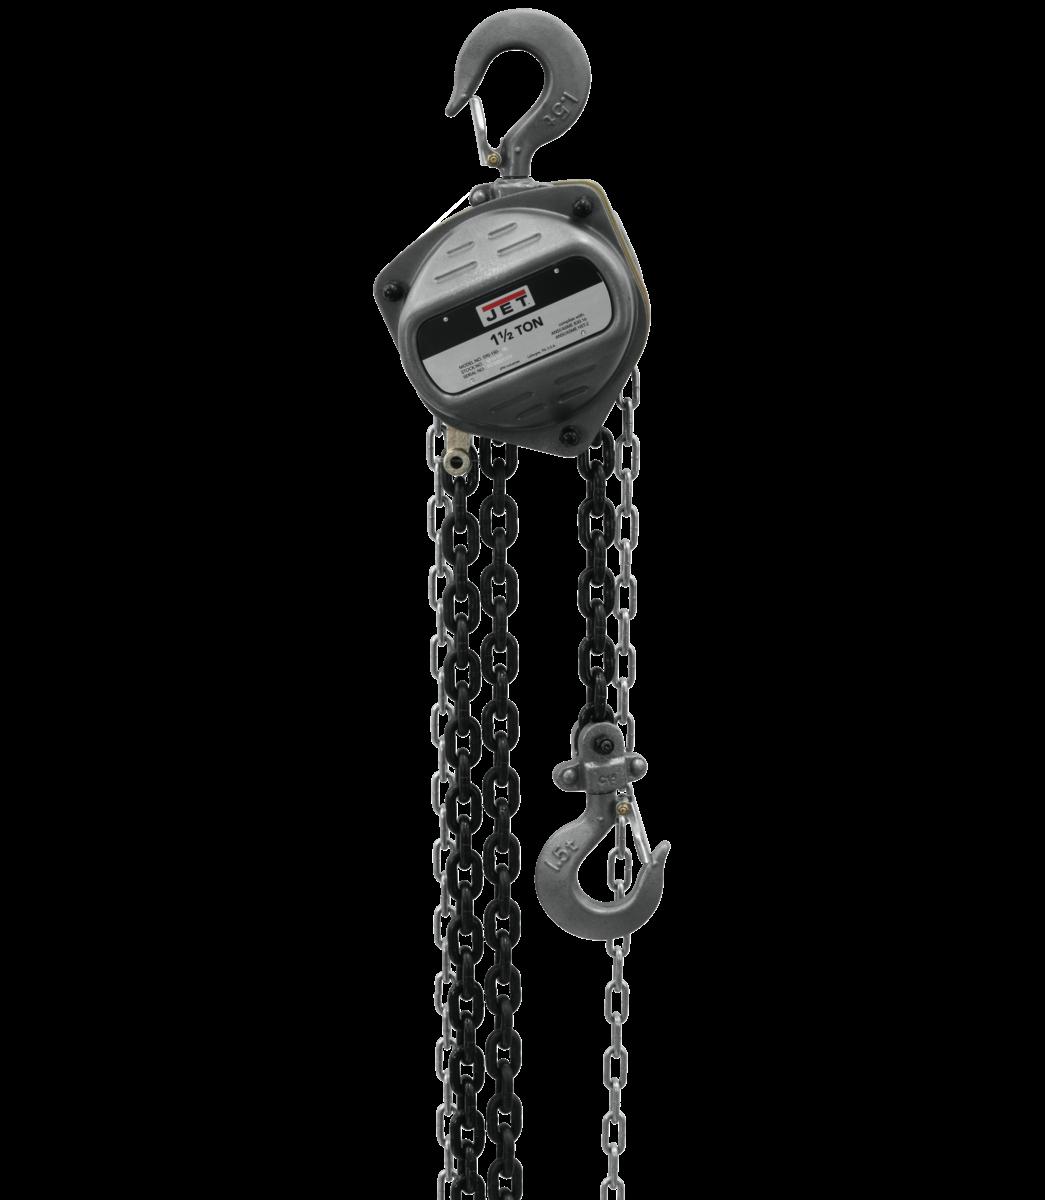 S90-150-30, 1-1/2-Ton Hand Chain Hoist With 30' Lift